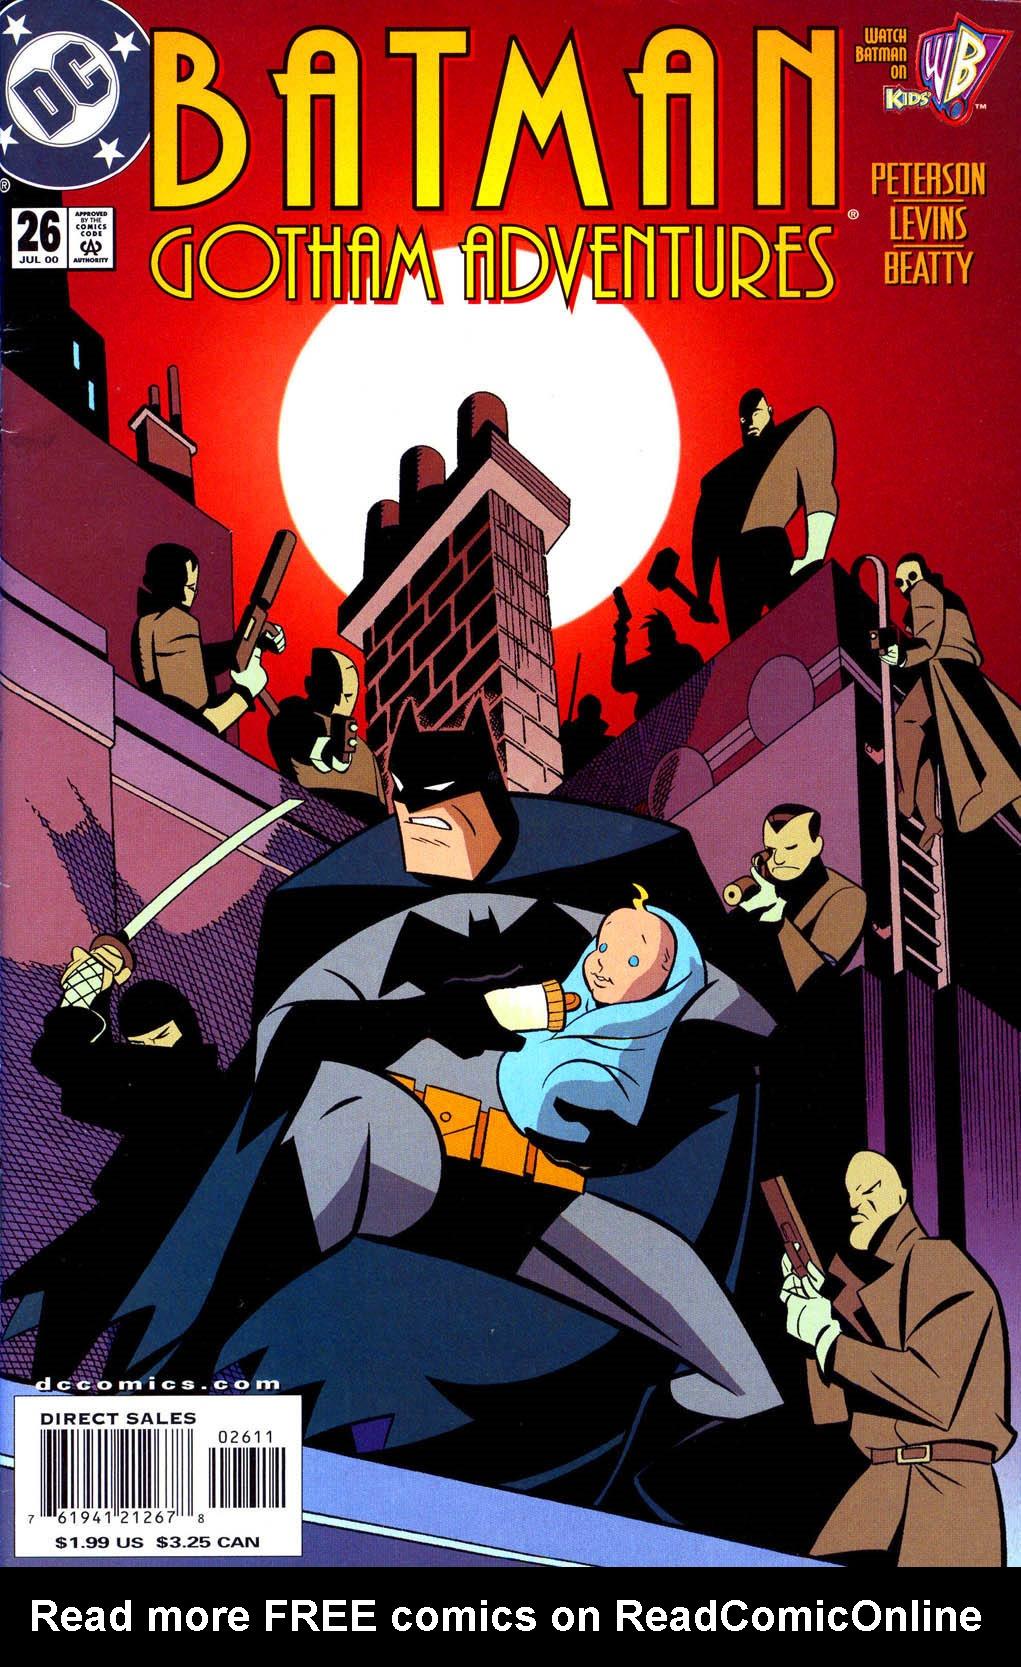 Batman: Gotham Adventures 26 Page 1